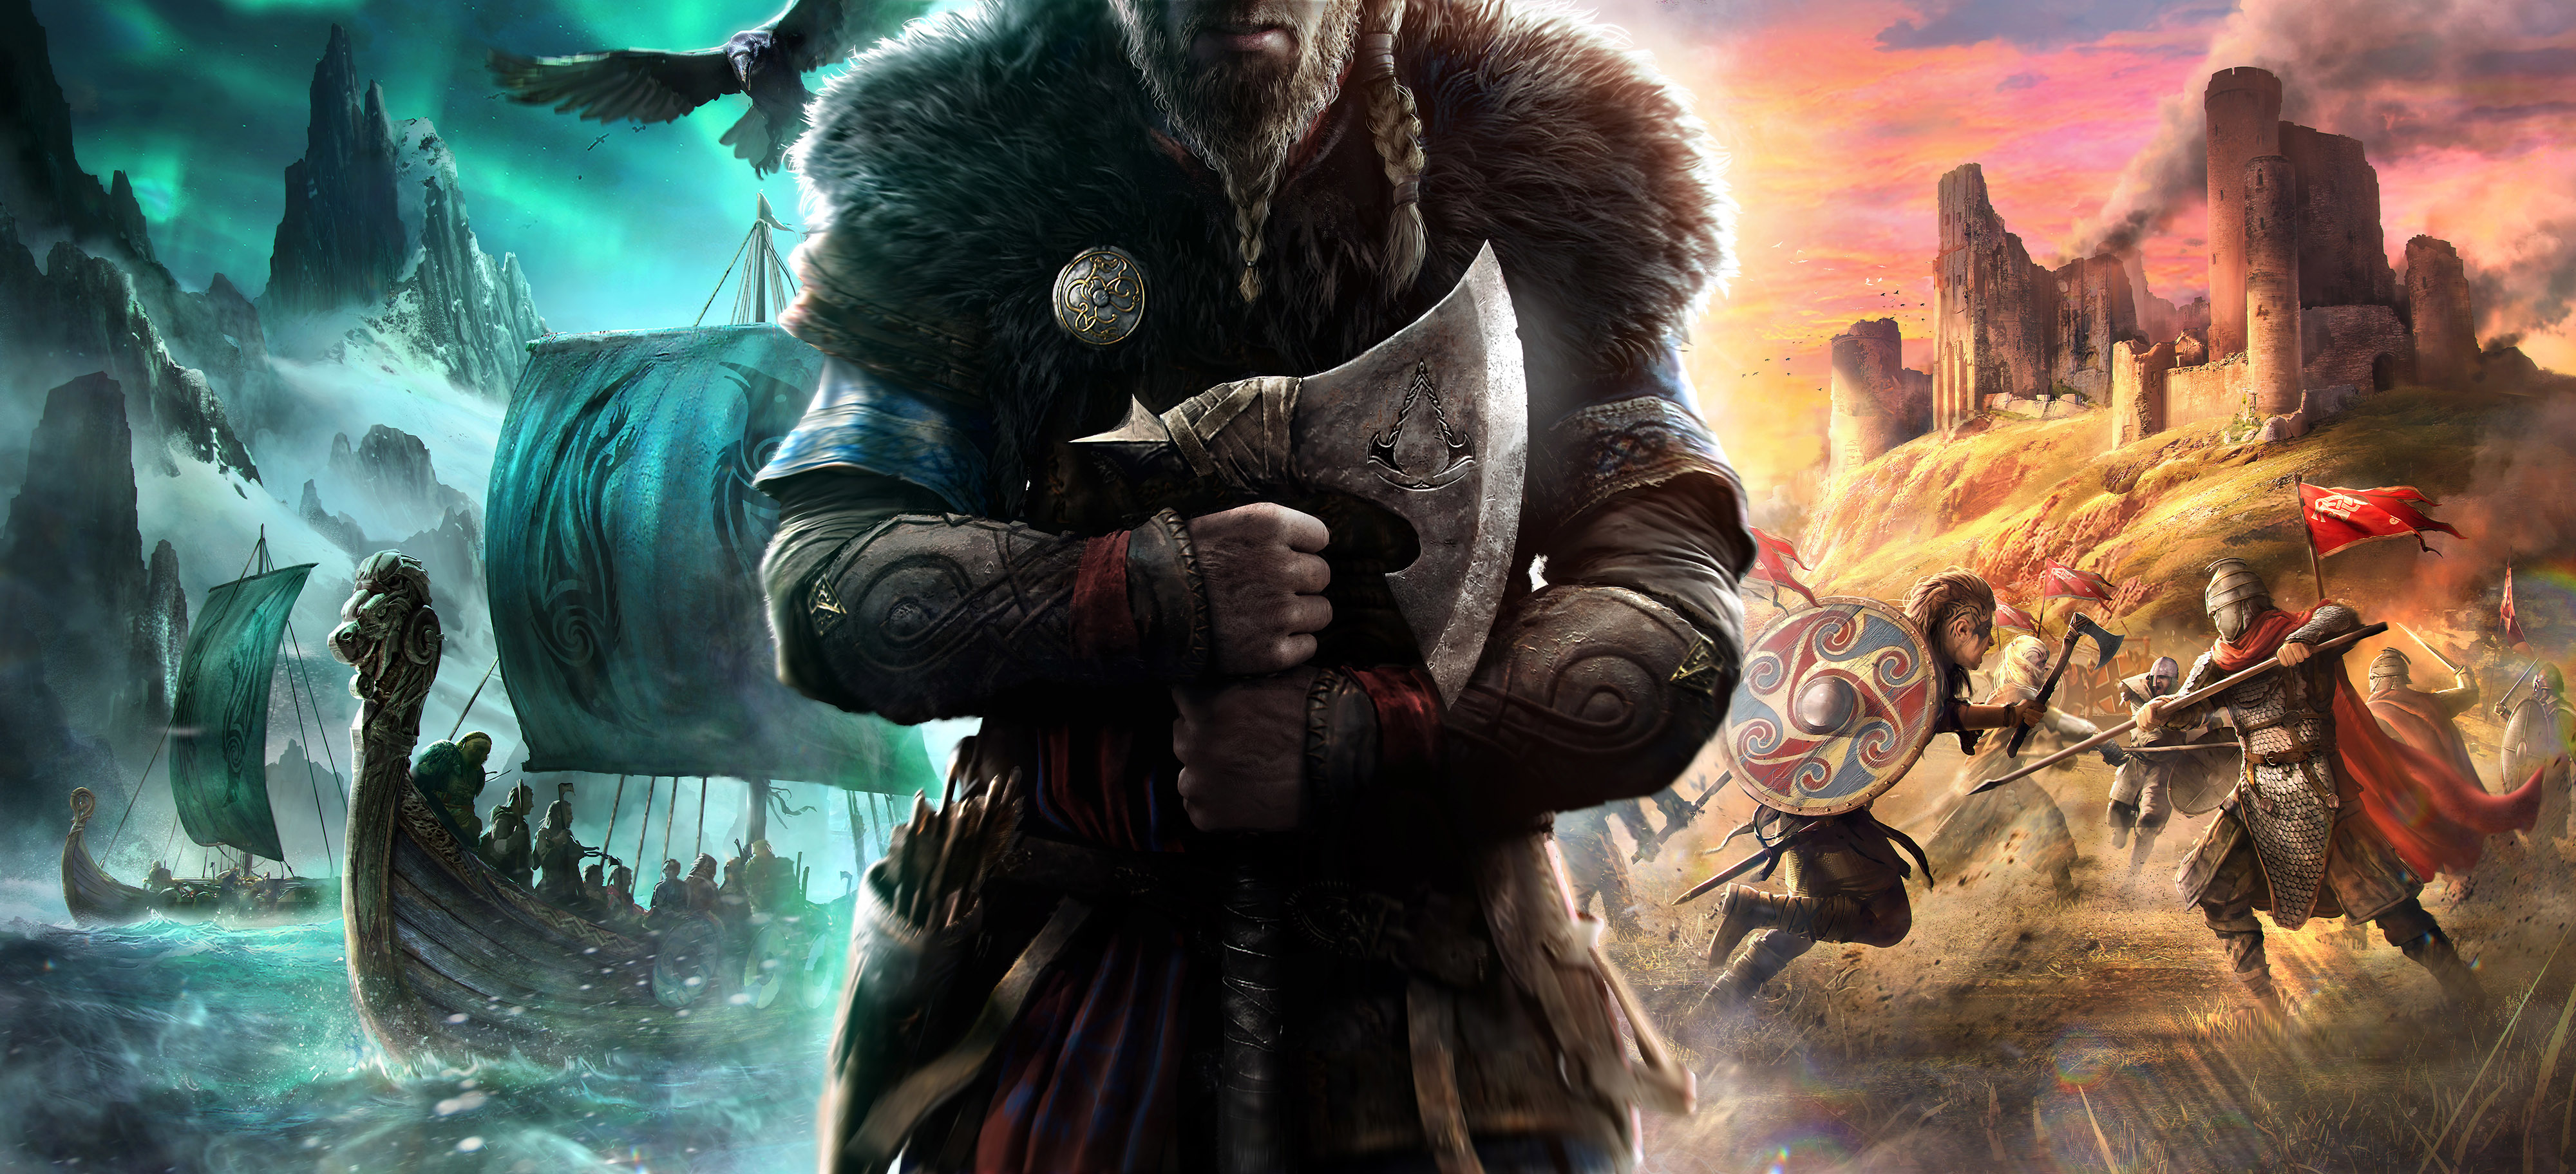 Assassins Creed Valhalla 4K Wallpaper HD Games 4K Wallpapers 4000x1823